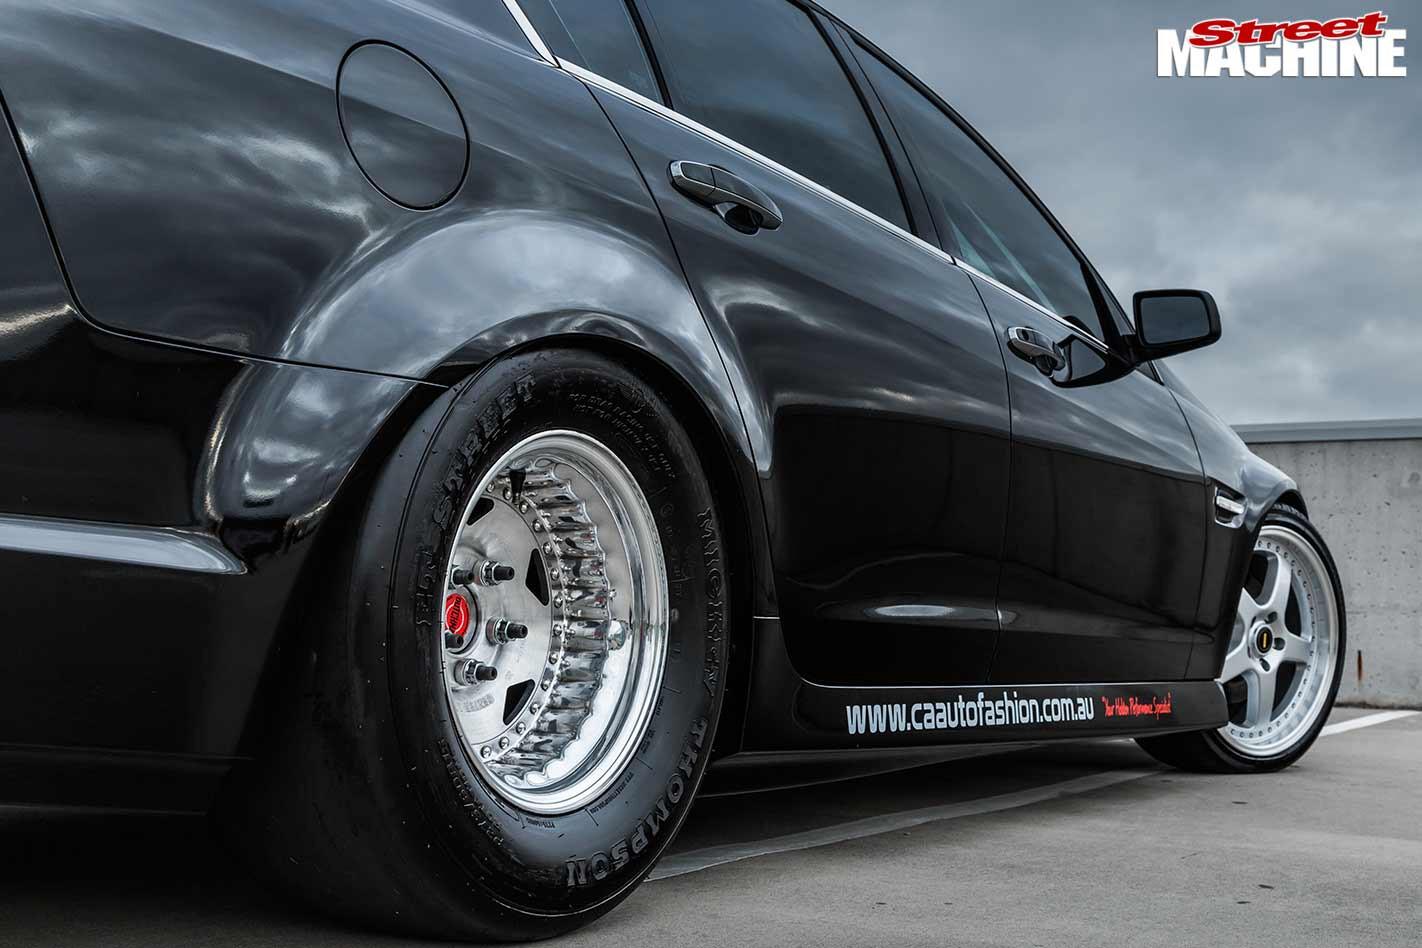 Holden Commodore wheel